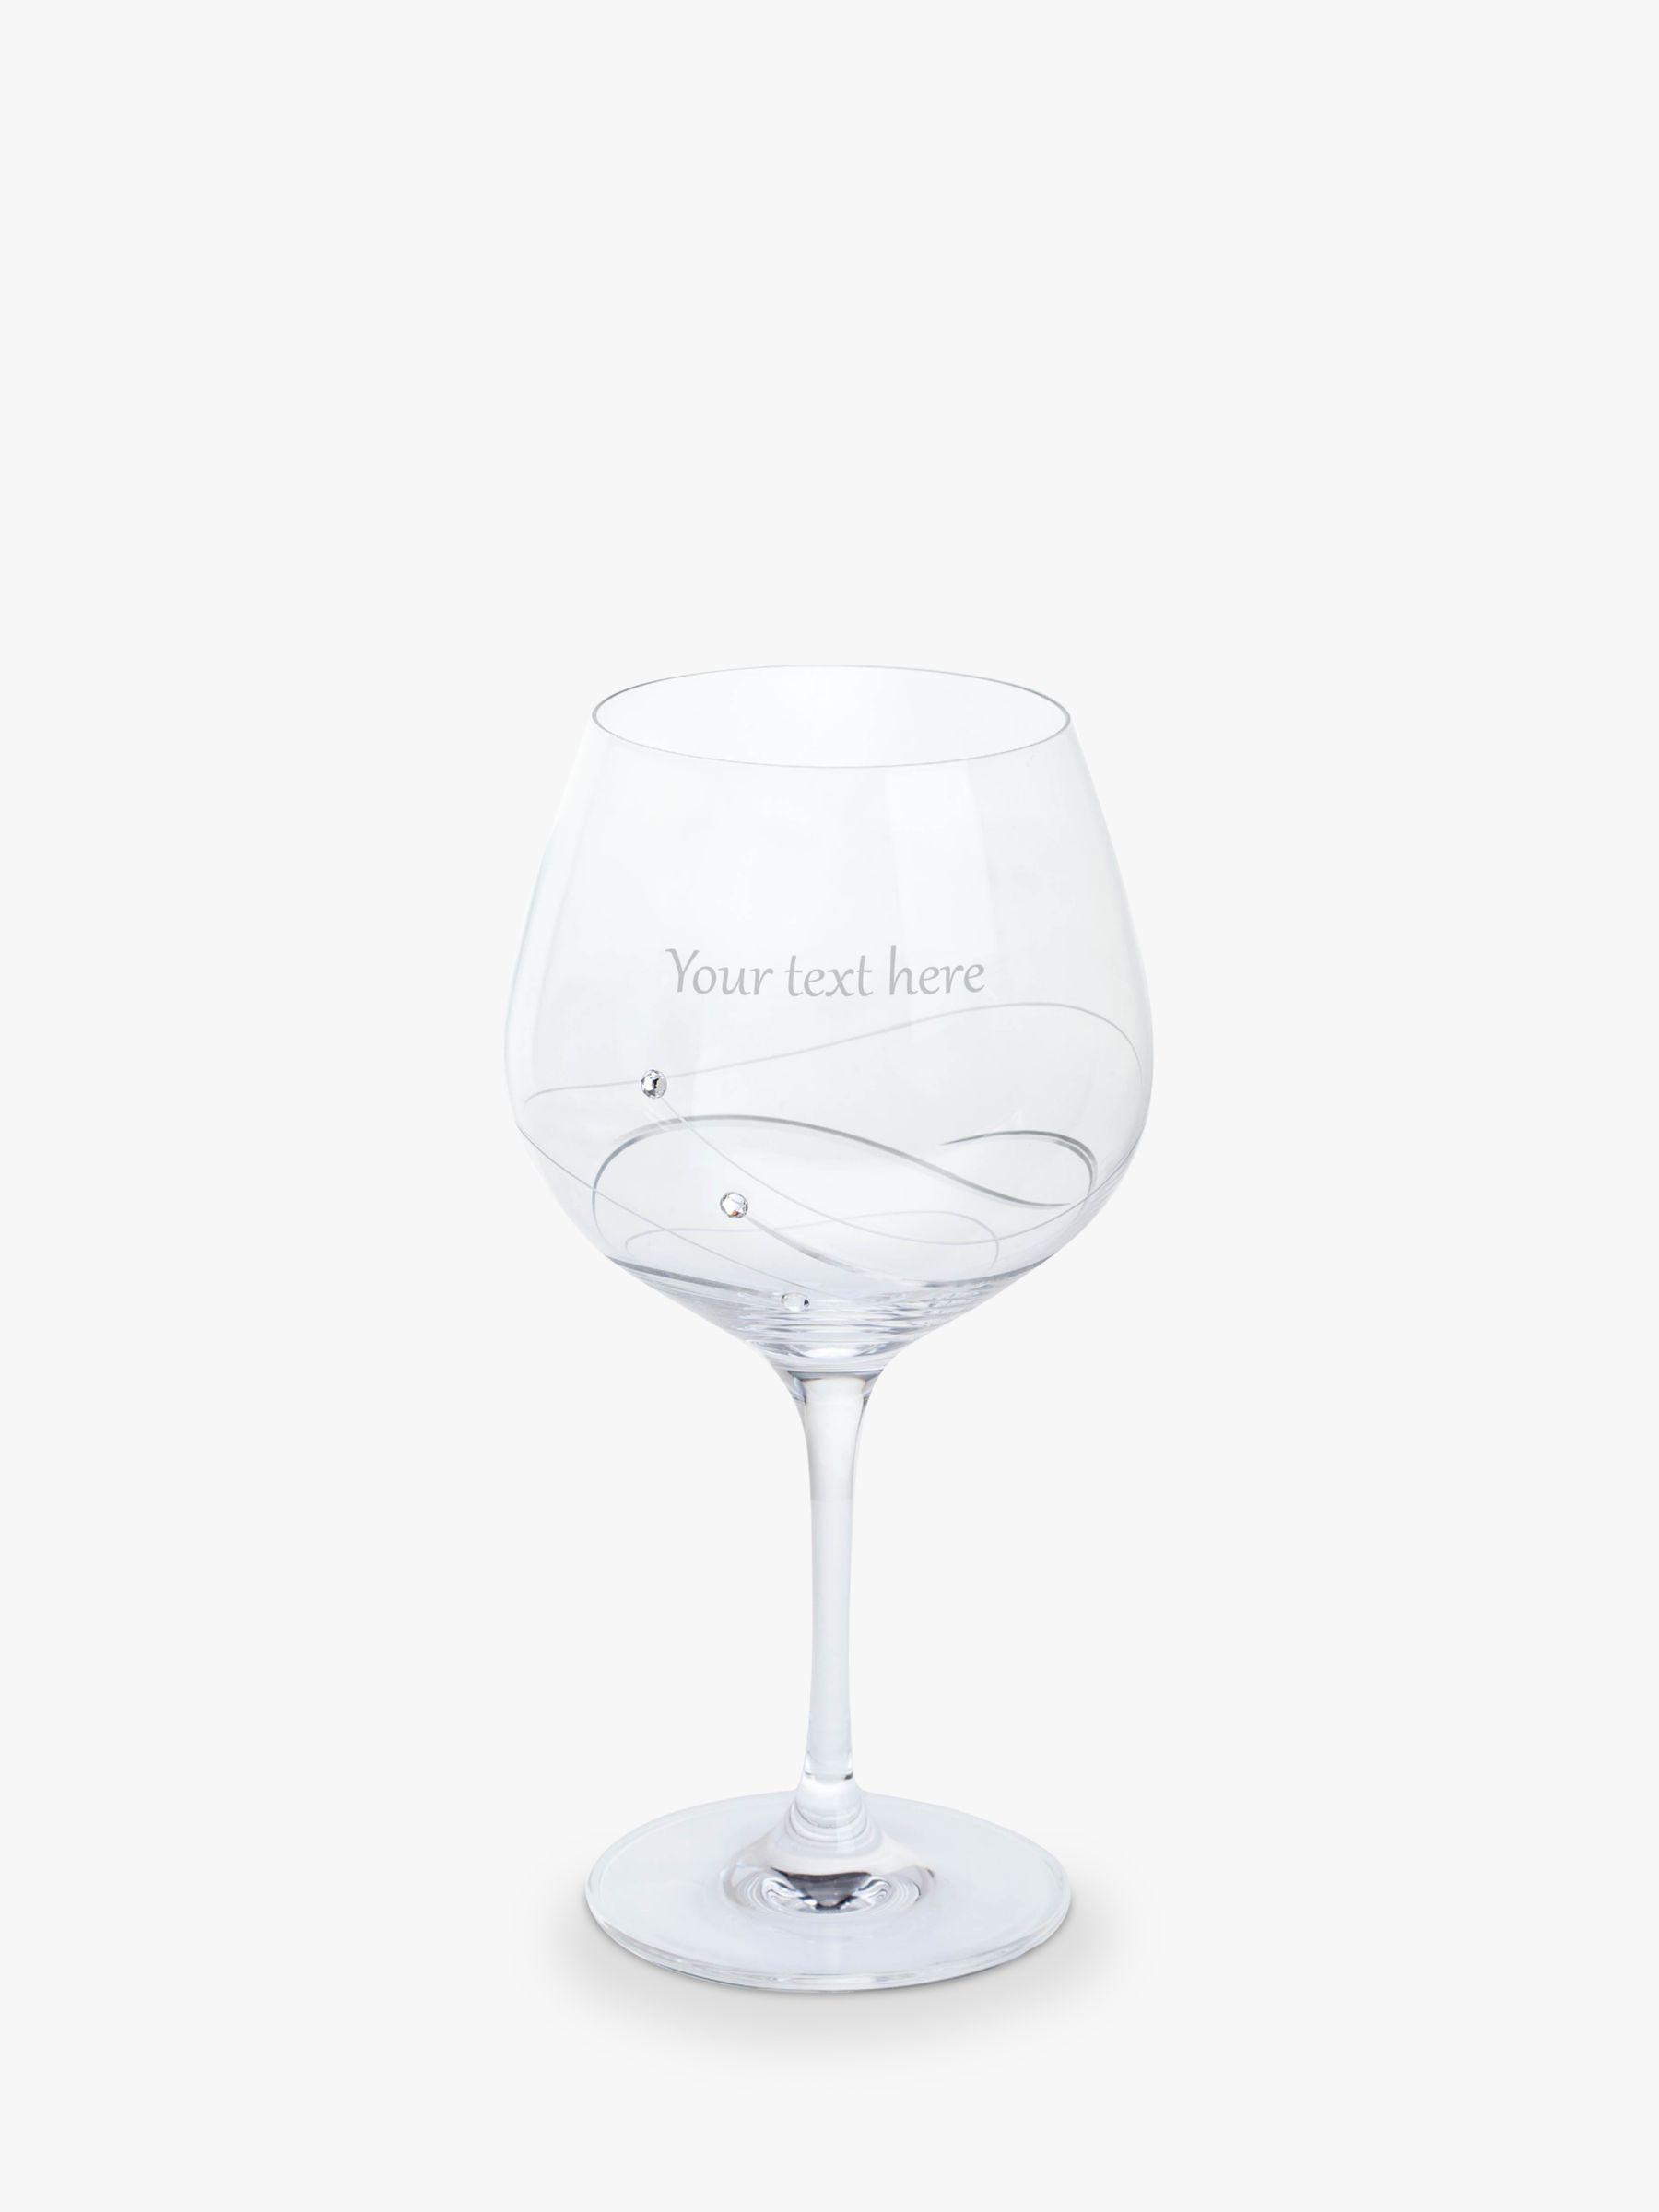 Dartington Crystal Dartington Crystal Personalised Glitz Gin and Tonic Copa (Single) Glass, 610ml, Gabriola Font